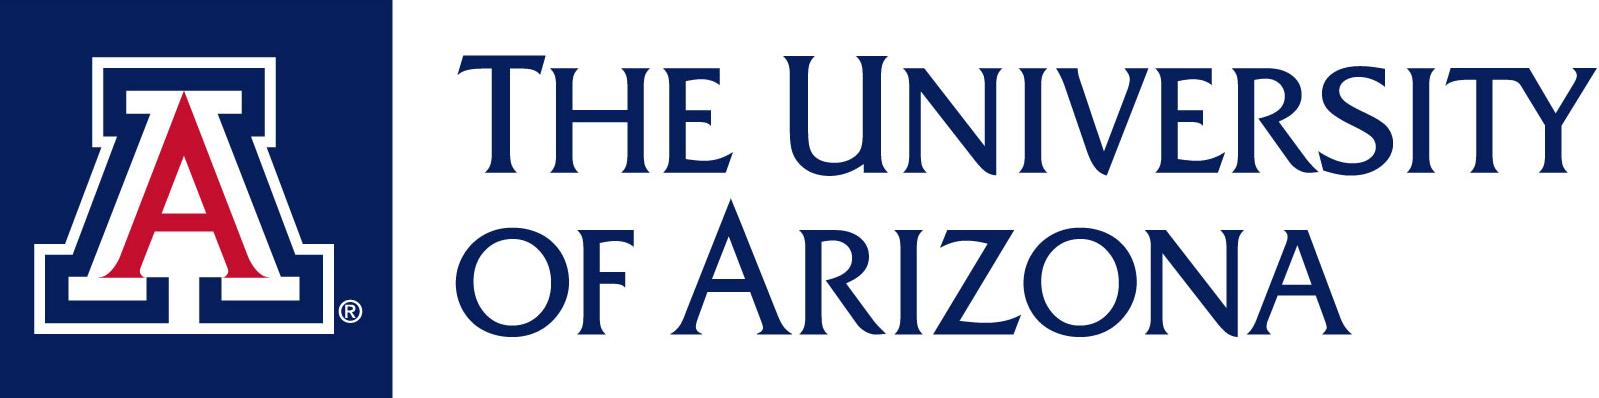 ranking of universities